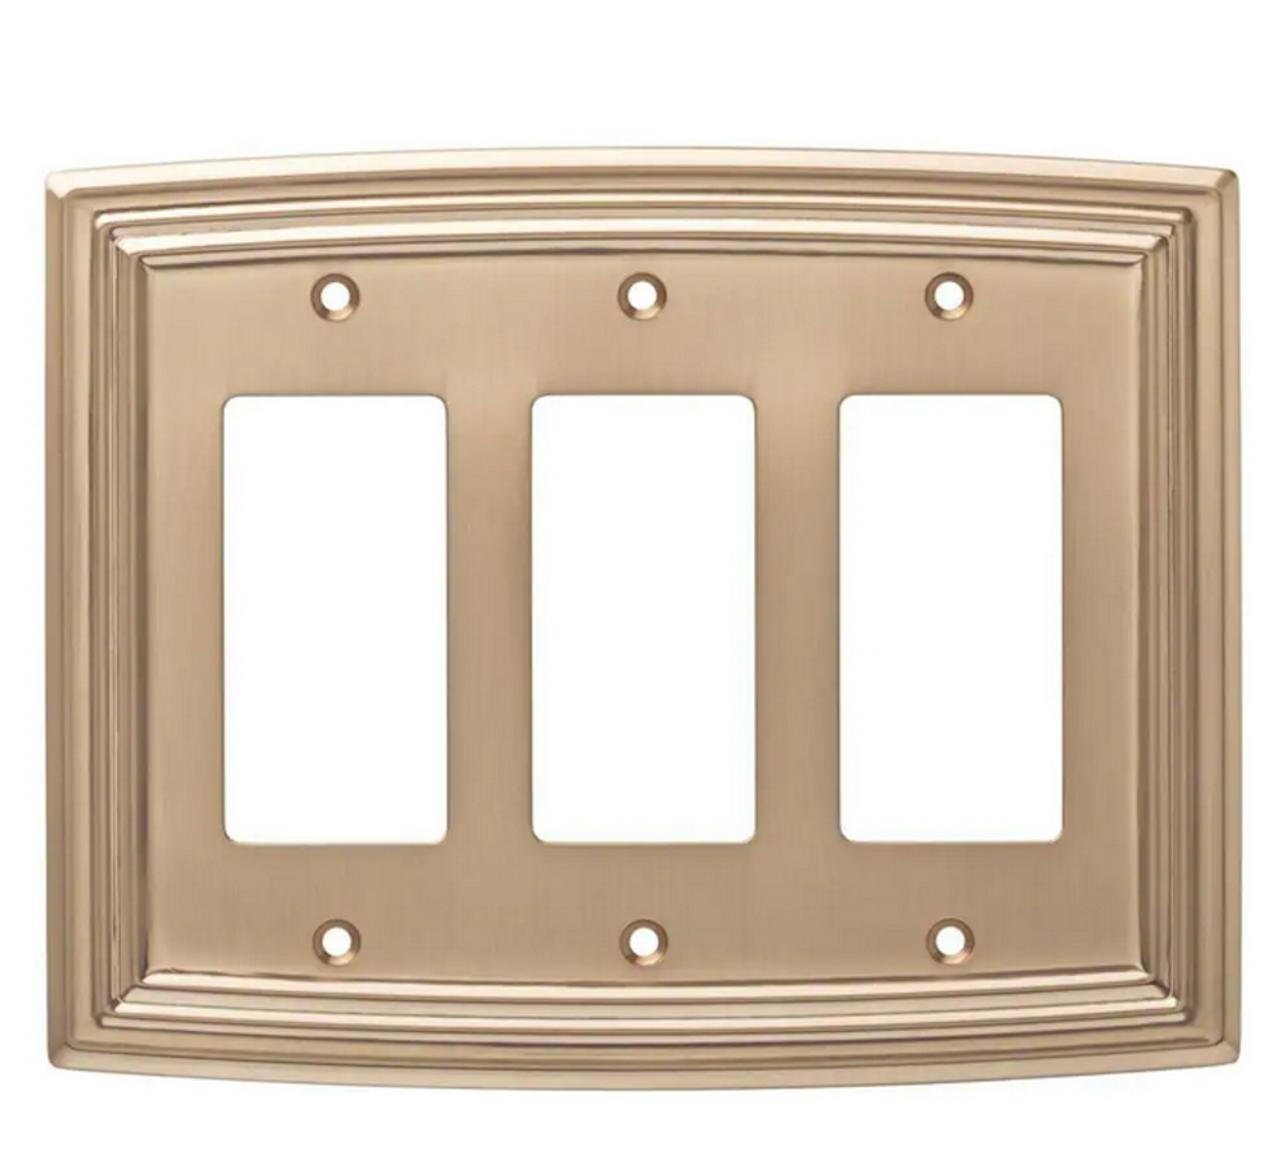 Hampton Bay W36405-CZ Classical Emery Triple GFCI Champagne Bronze Cover Plate